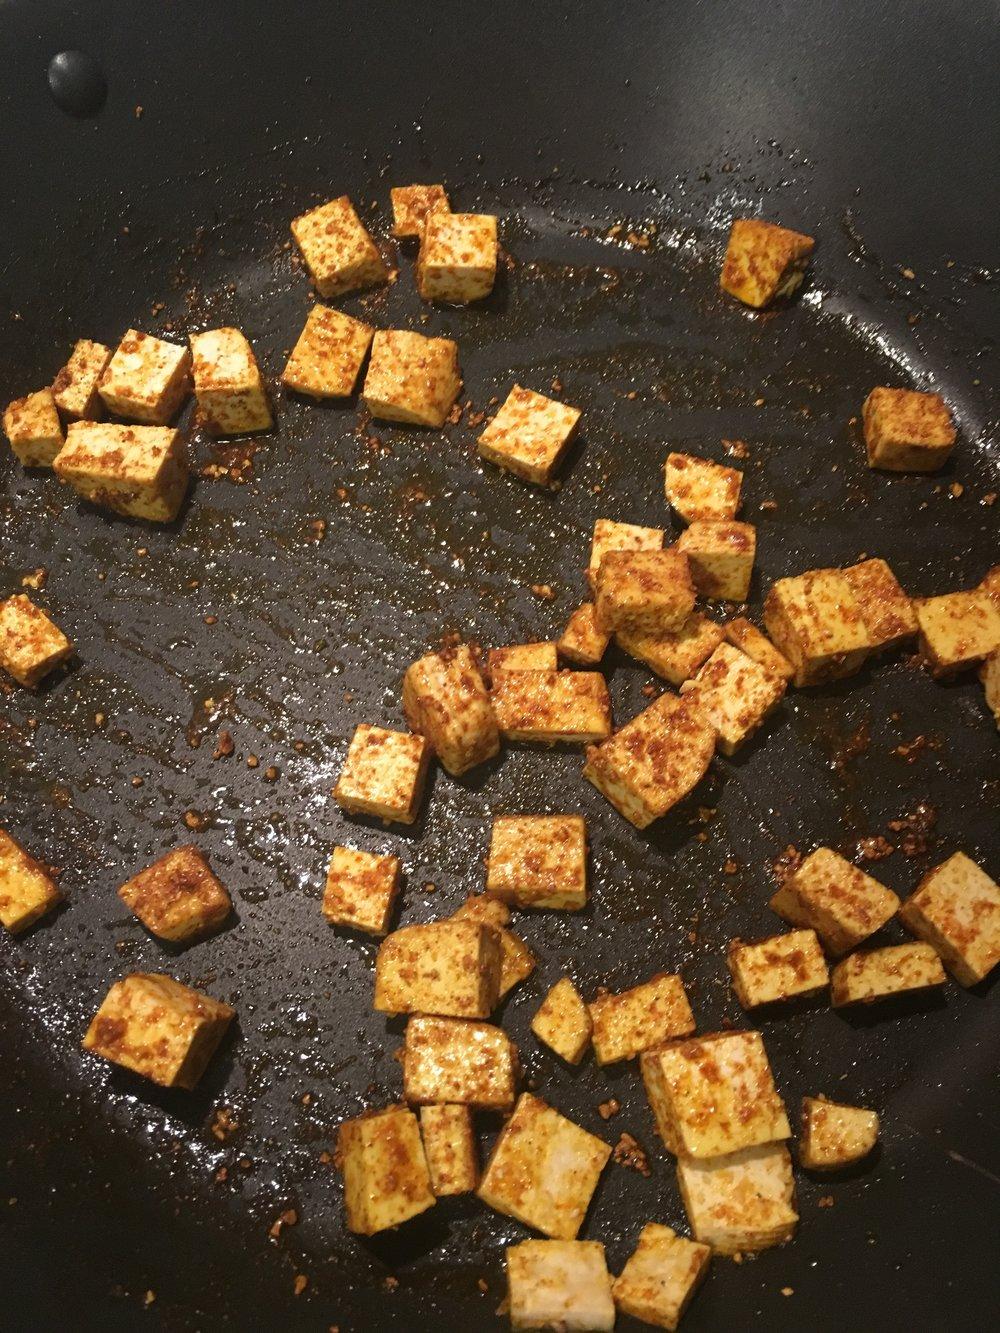 Tofu fried in chili garlic and Garam masala